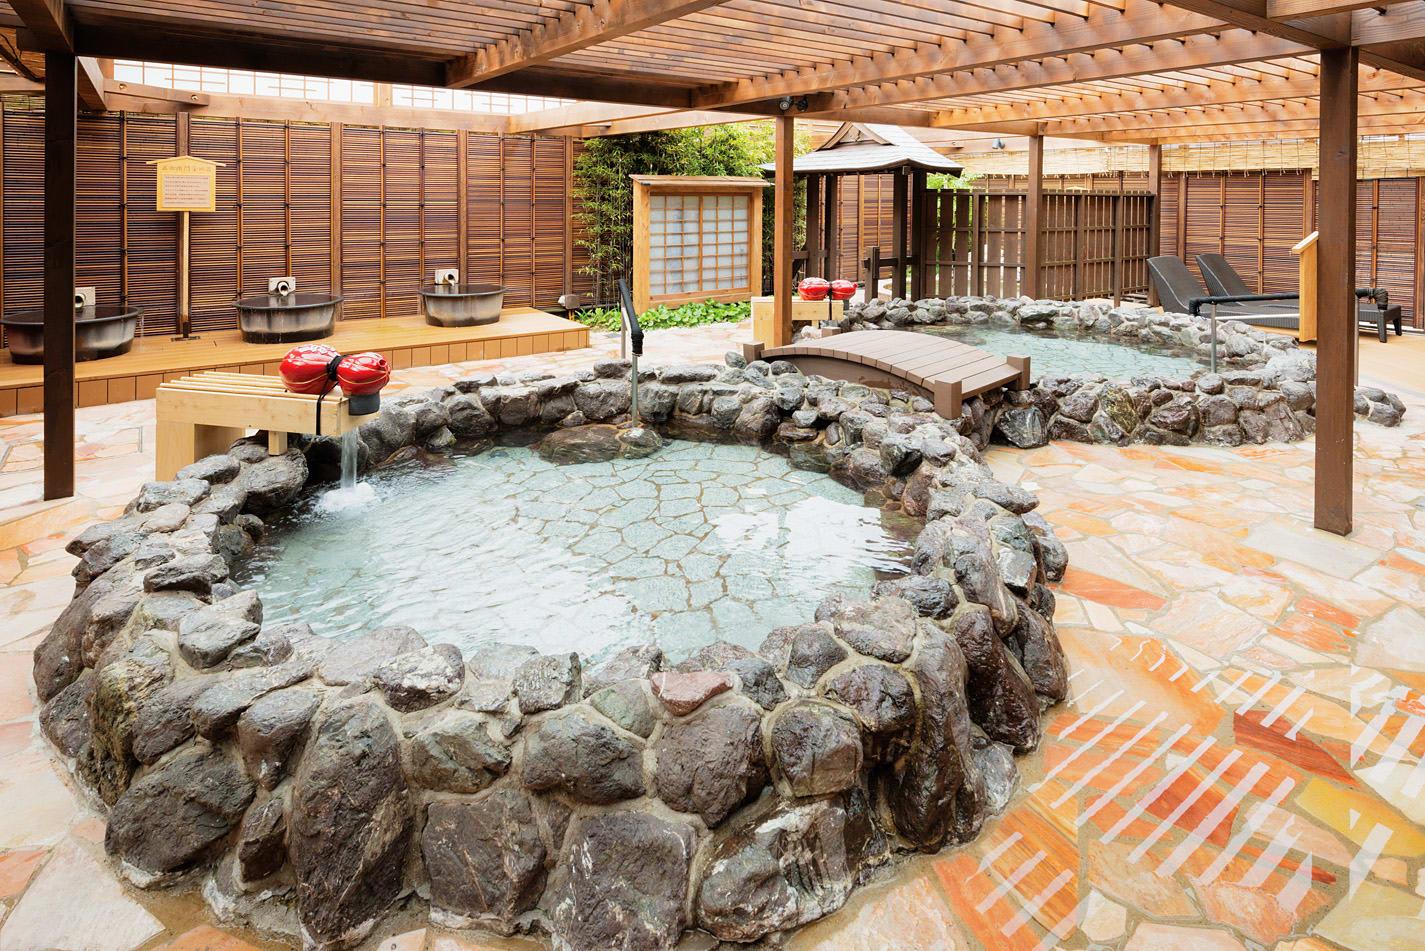 72 giờ ở osaka: tắm onsen